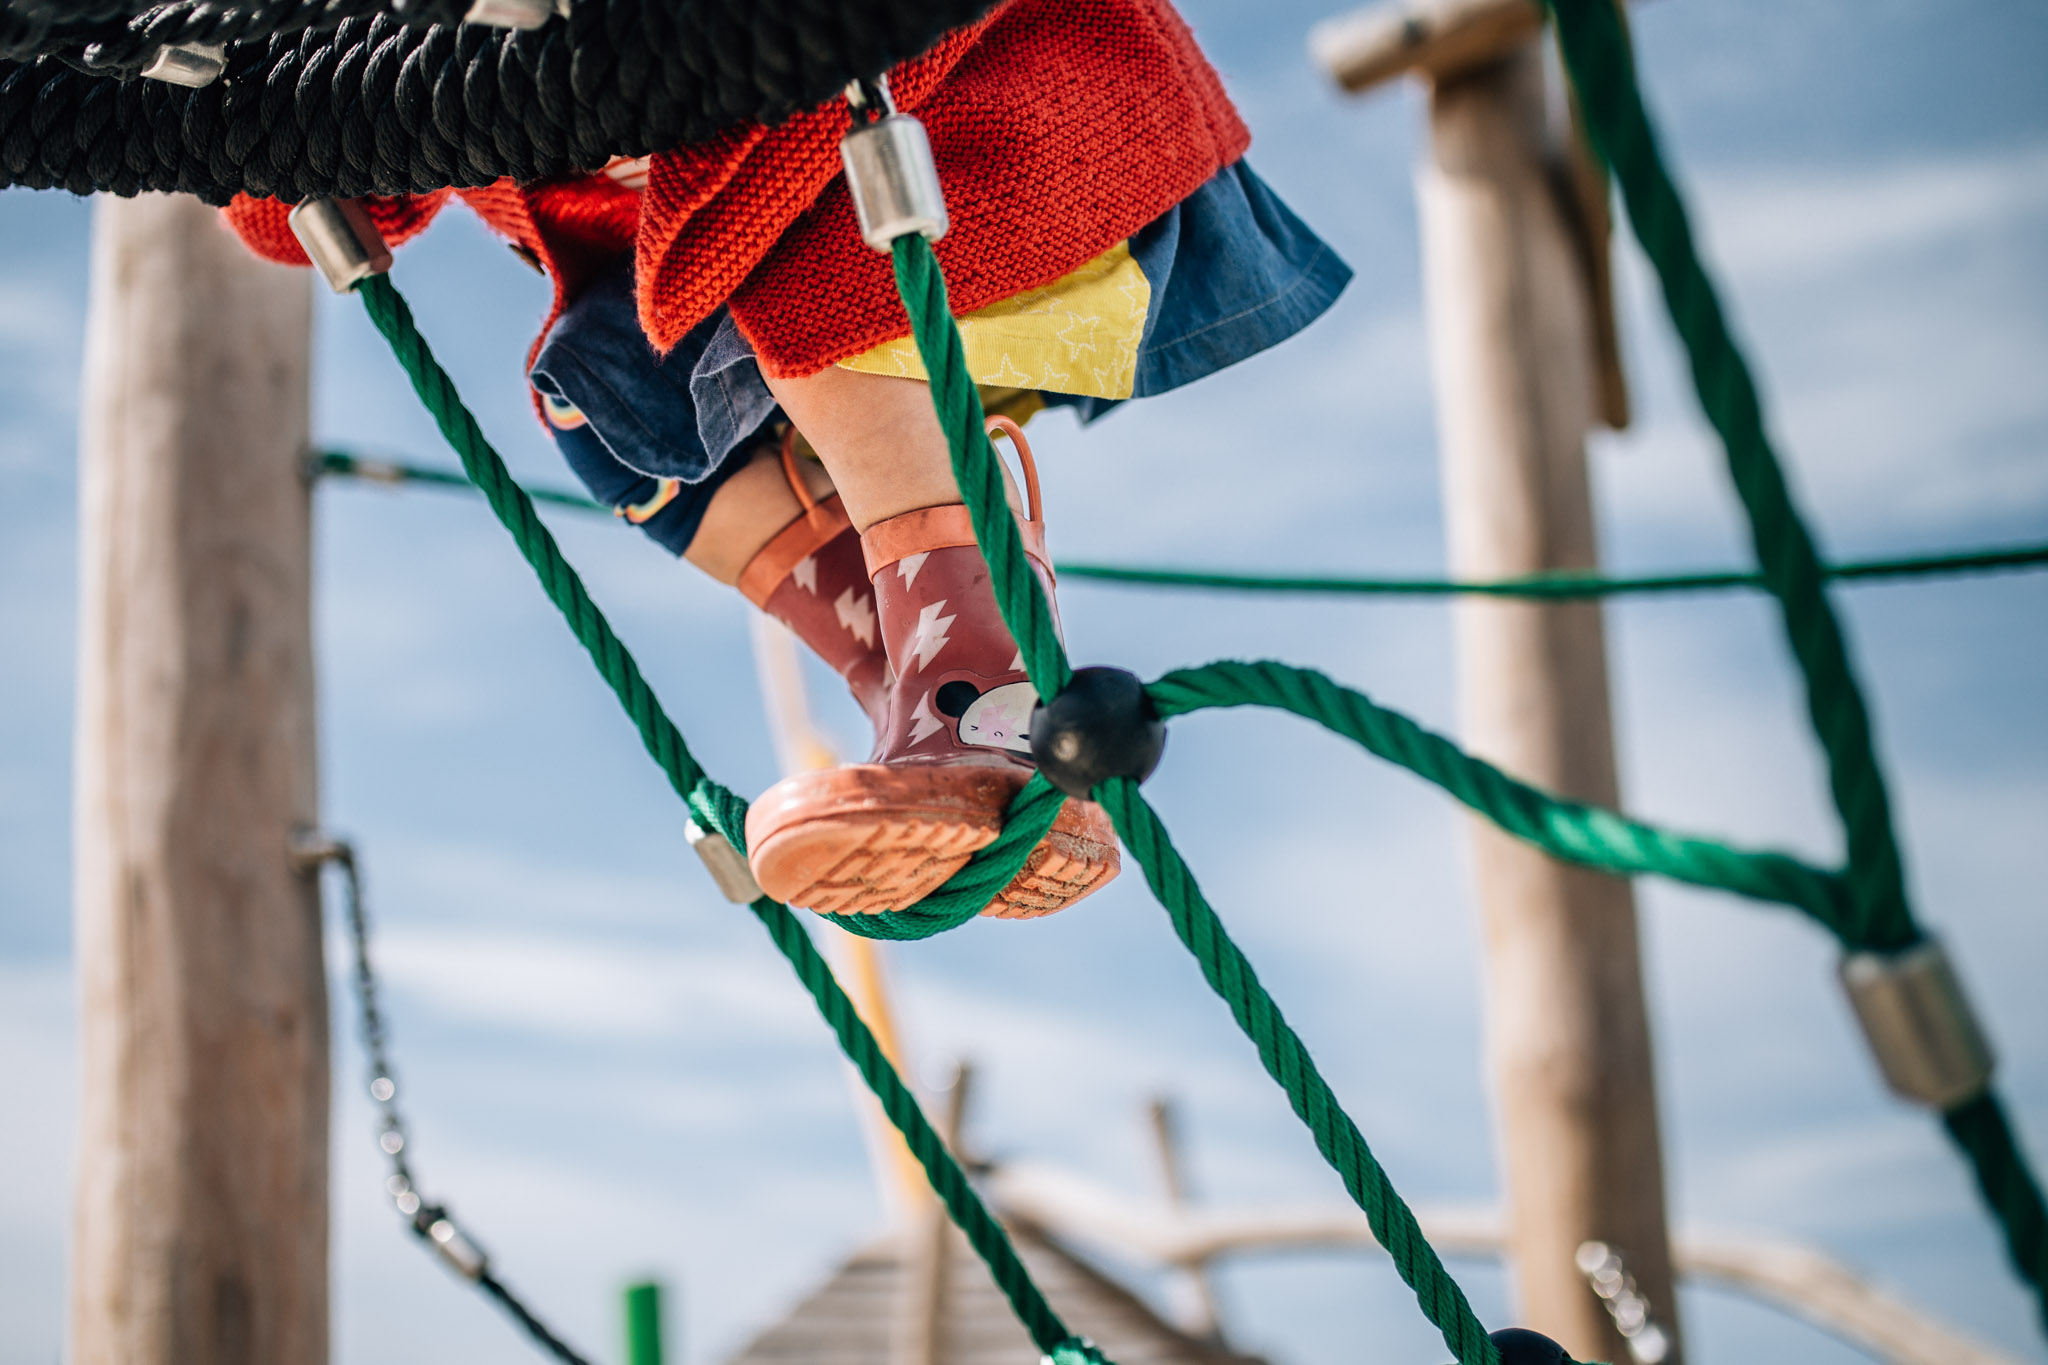 little girl in red cardigan climbing play equipment (1 of 1).jpg